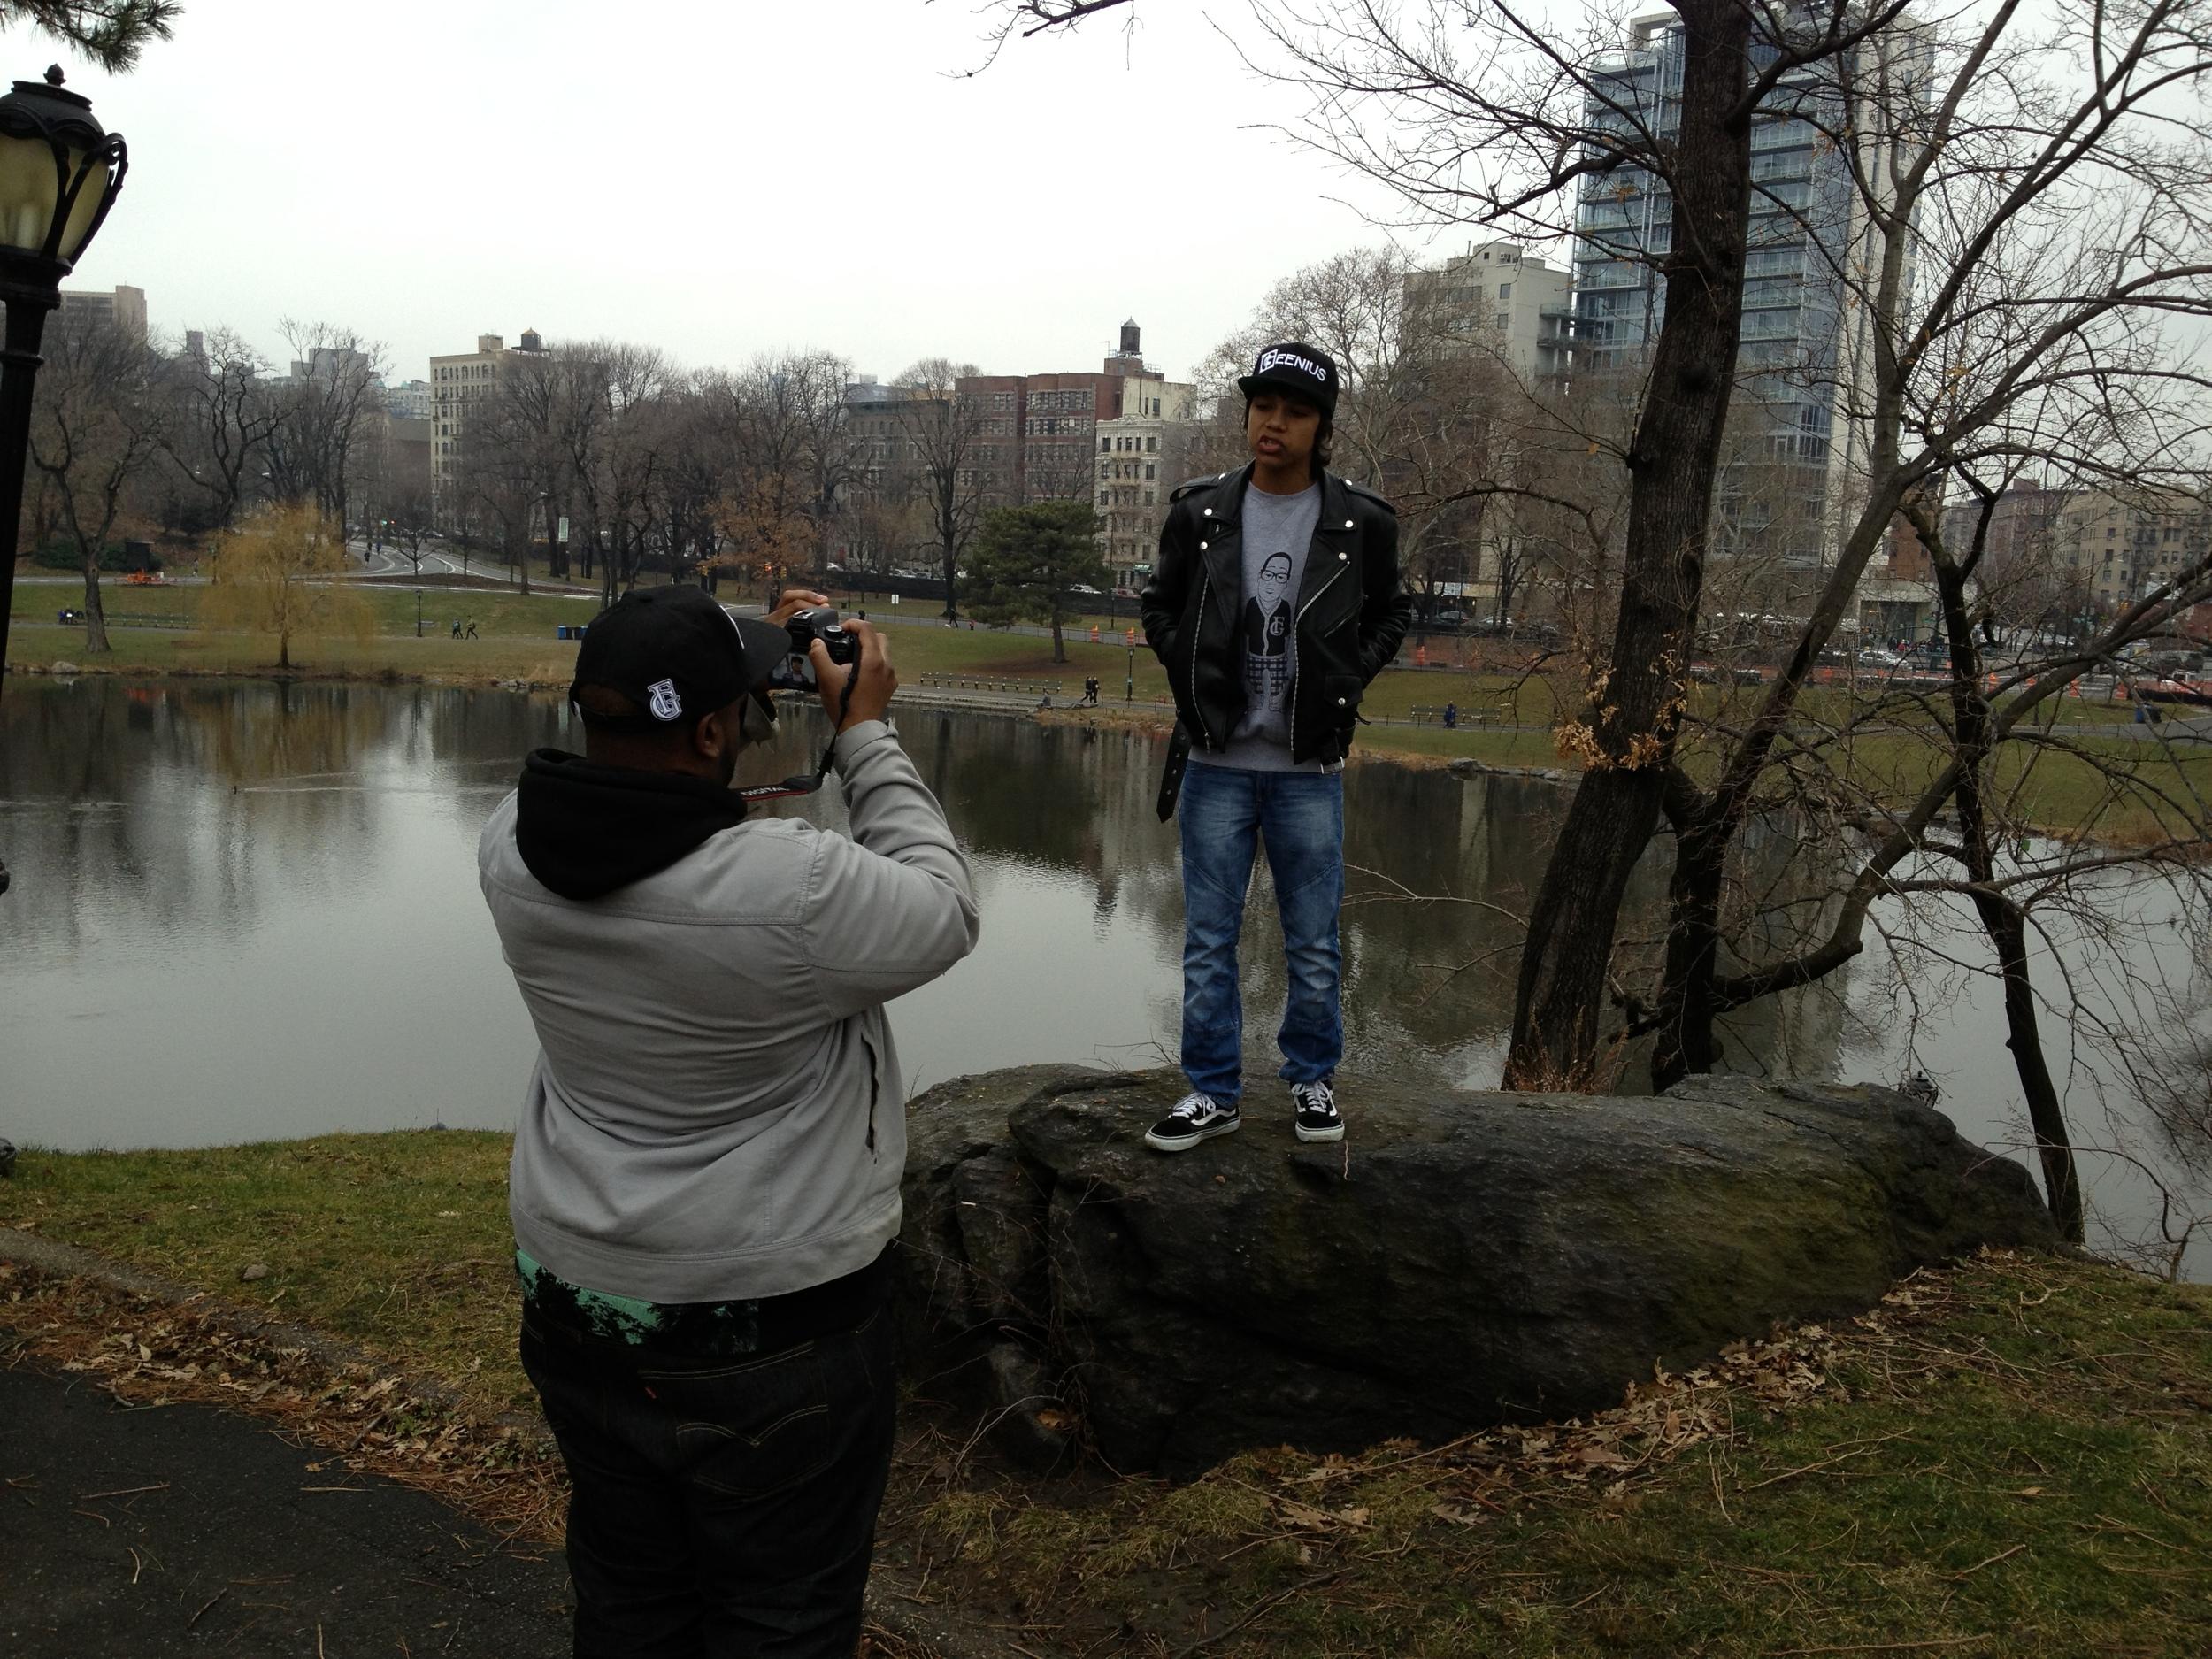 Tyler Central Park